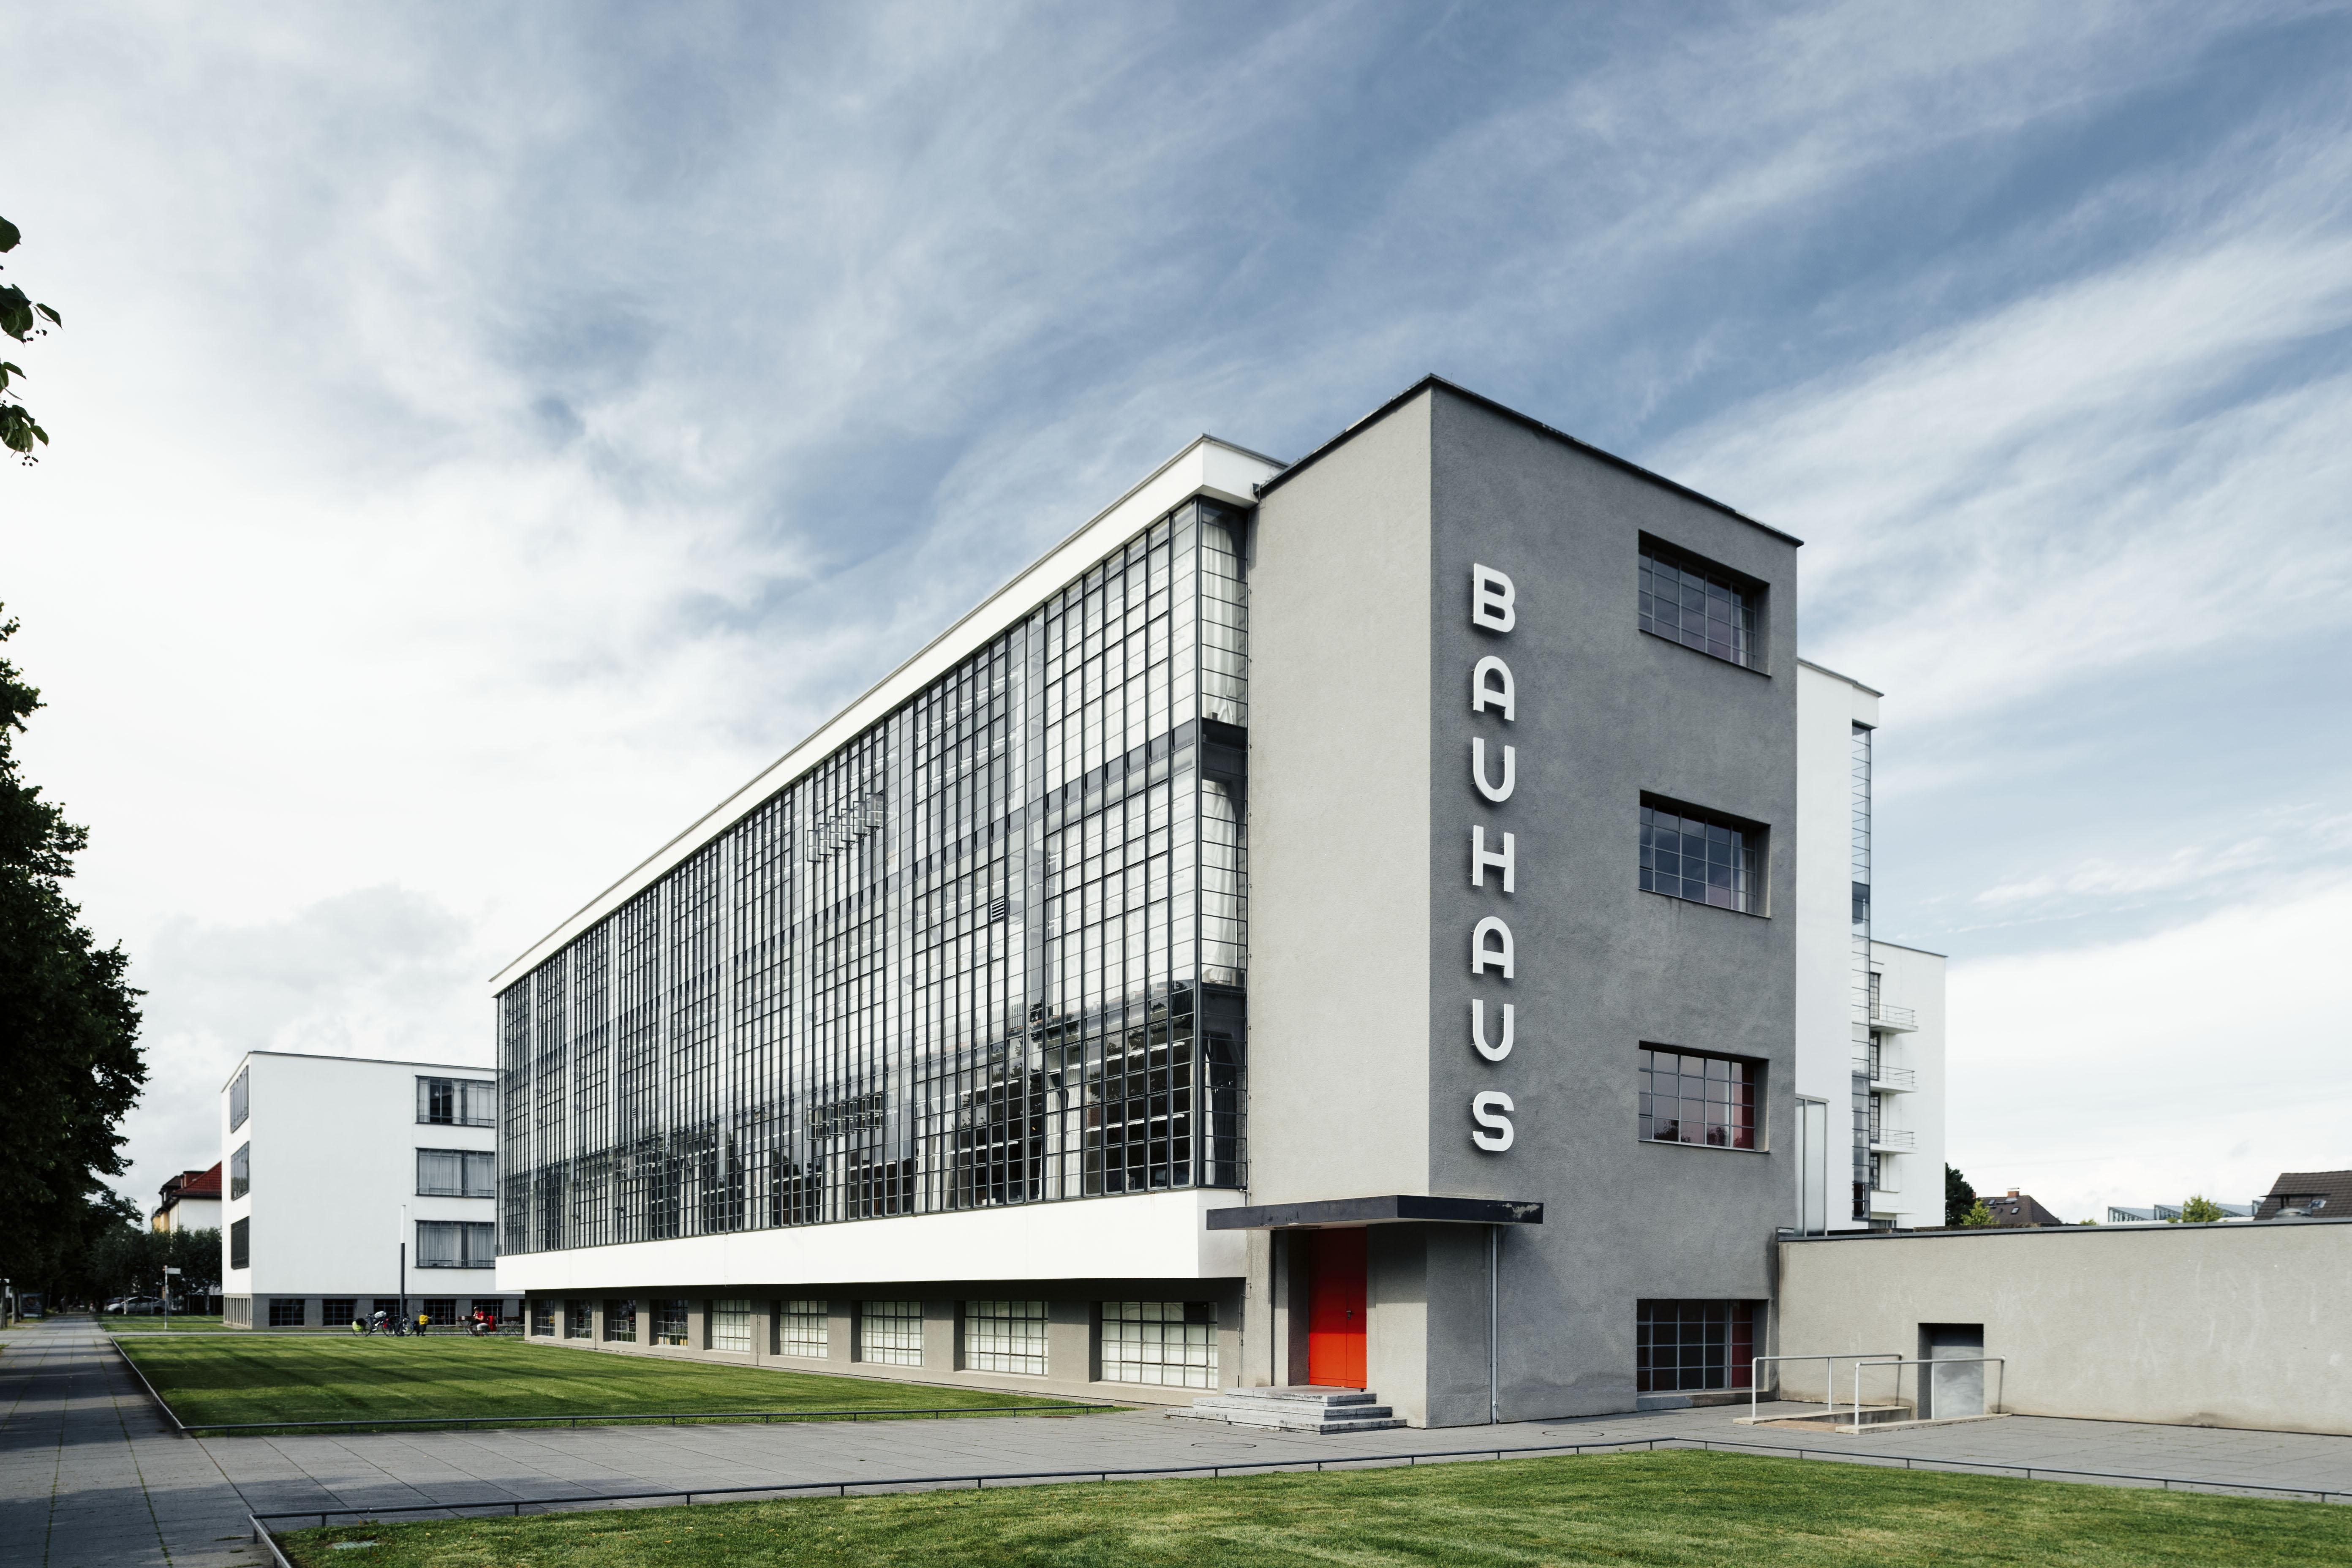 Dessau-Roßlau Bauhausgebäude / Bauhaus building (1925–26), Architekt / architect: Walter Gropius Photo: © Tillmann Franzen, tillmannfranzen.com © VG Bild-Kunst, Bonn 2018